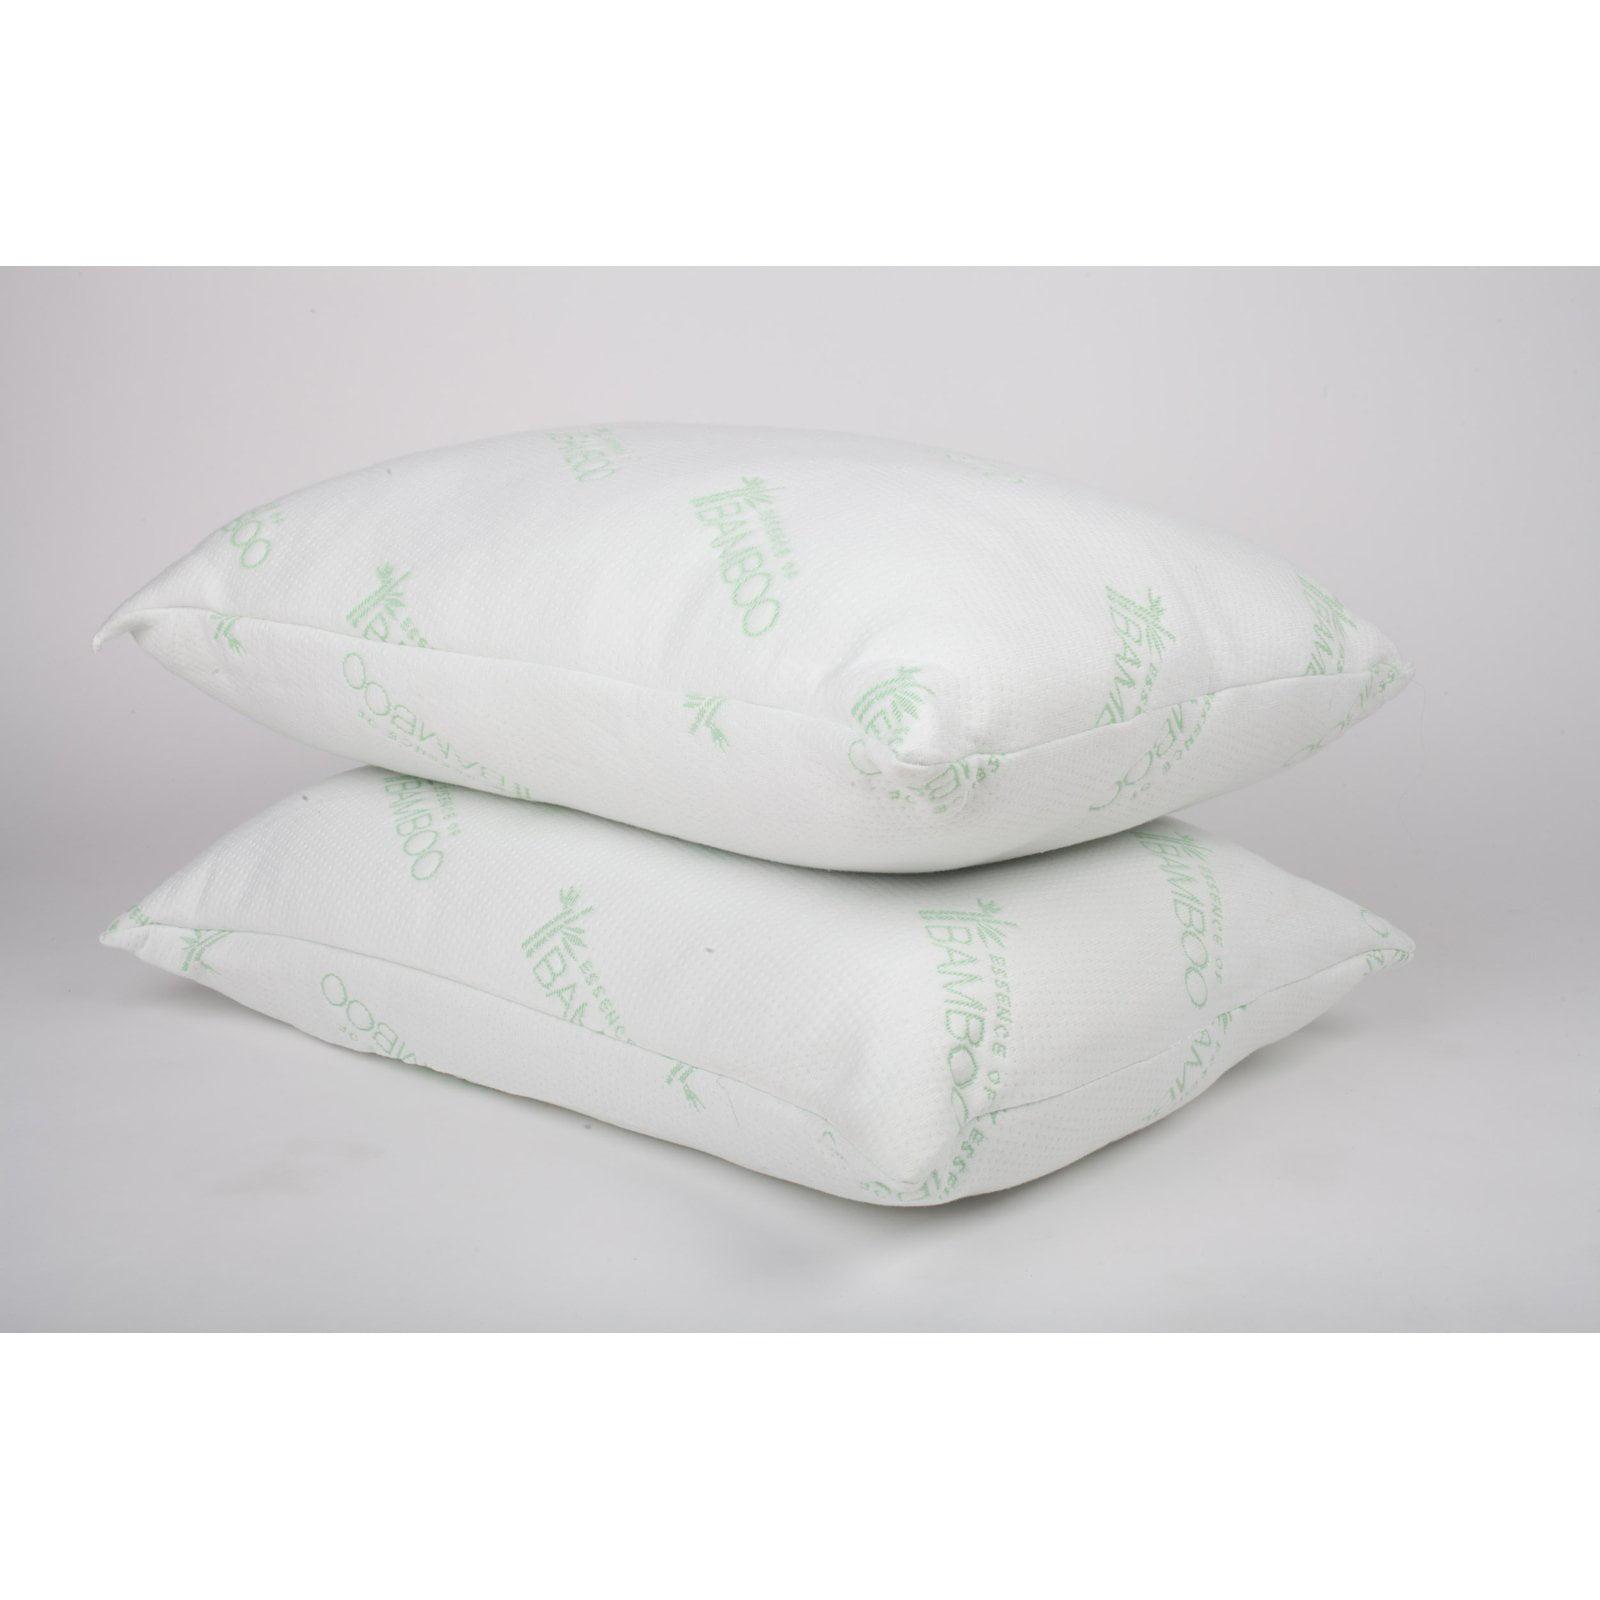 Ipod Pillow Essence Of Bamboo Knit Bed Pillow Set Of 2 Walmartcom